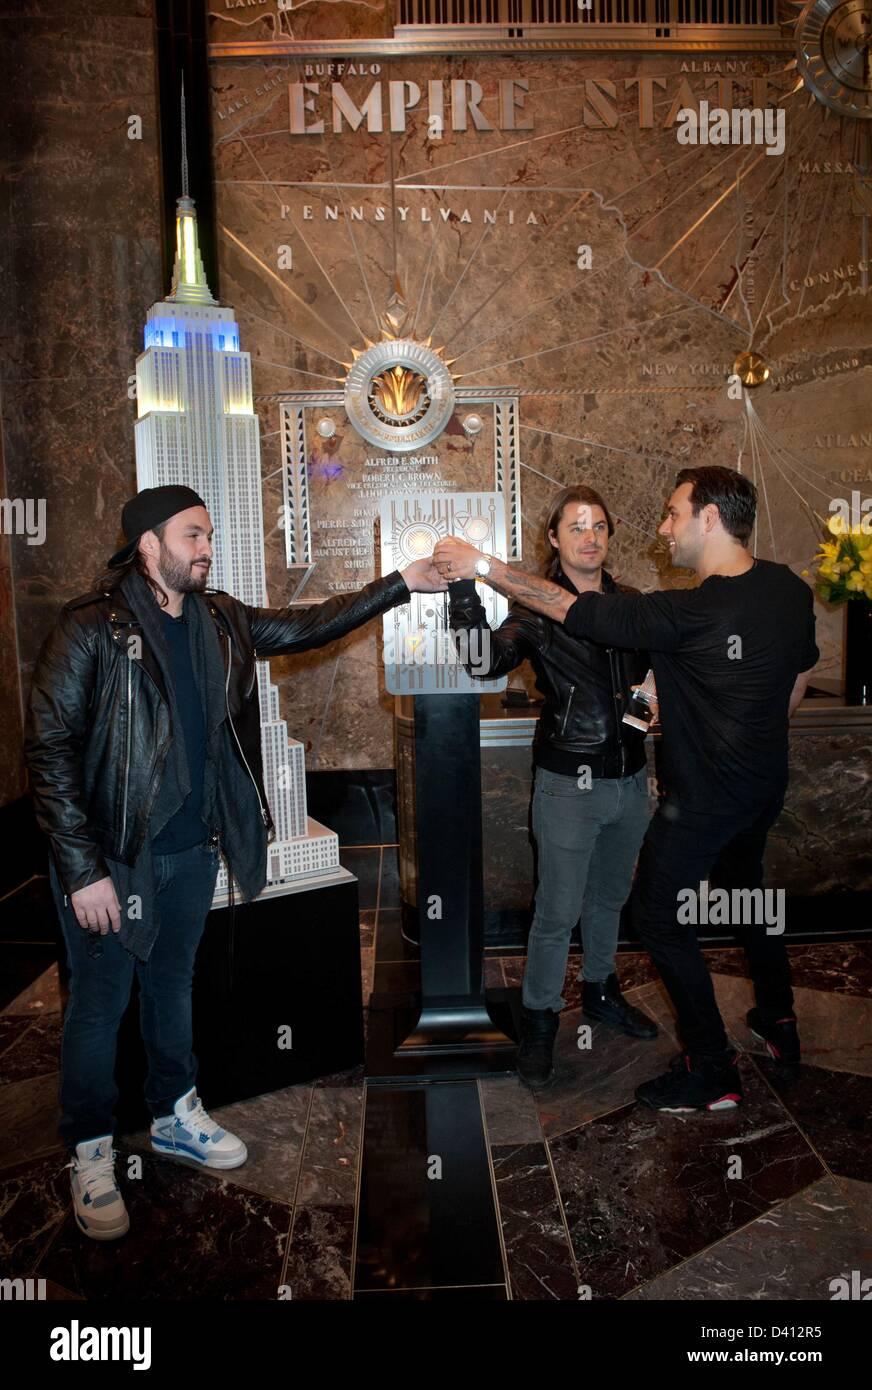 Manhattan, New York, U.S. Feb. 28, 2013. Swedish House Mafia, STEVE ANGELLO, AXWELL and SEBASTIAN INGROSSO, lights Stock Photo